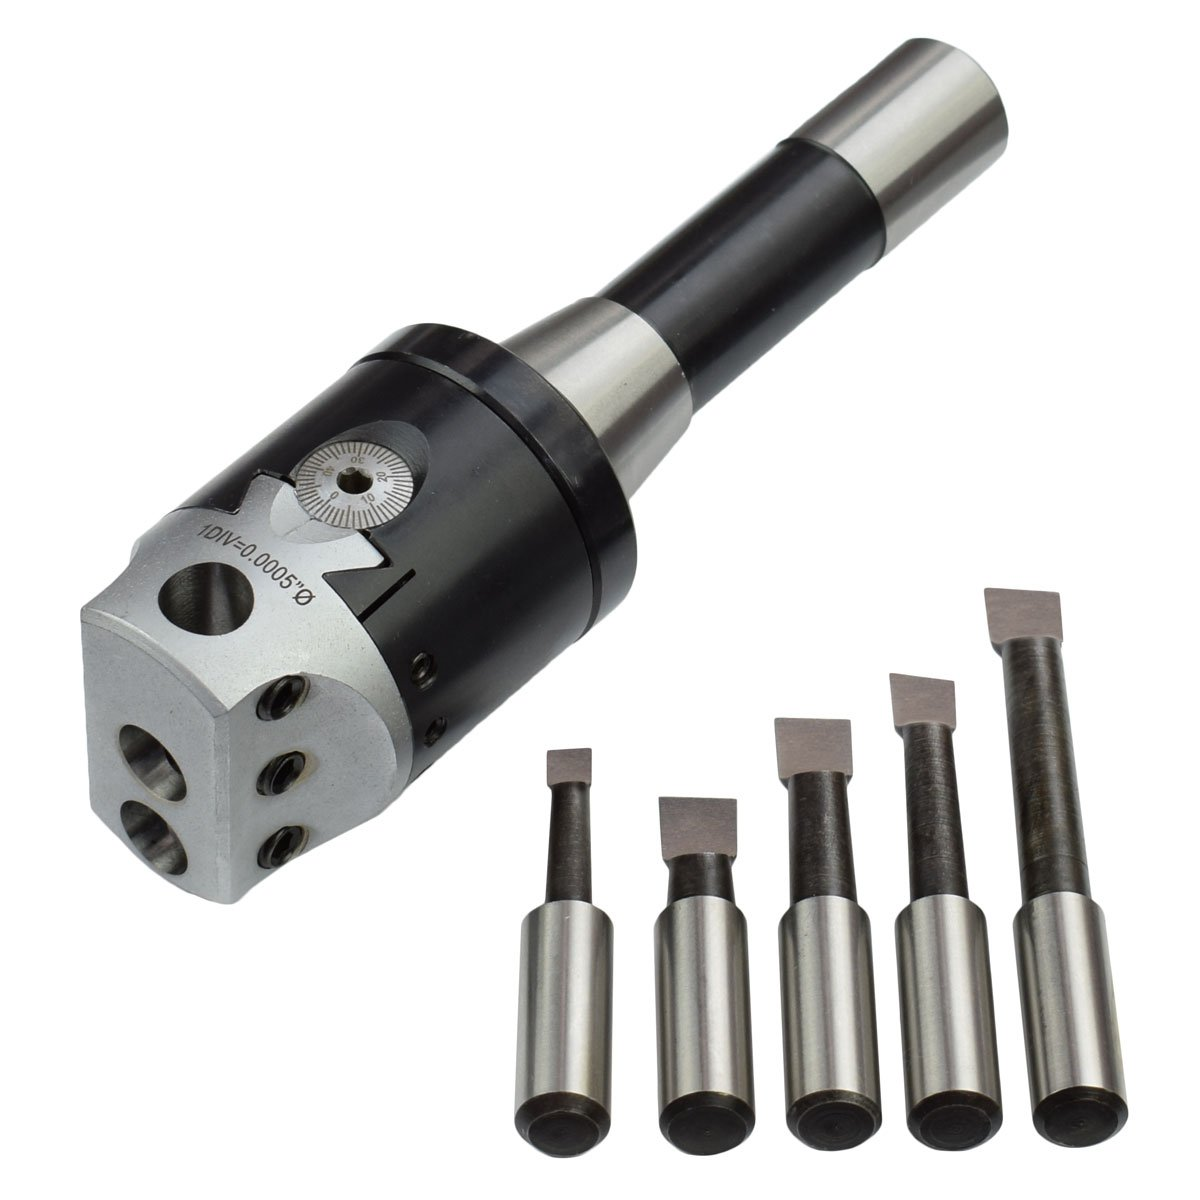 Haosegd R8 Shank 2 Boring Head 9 PCS 1//2 Inch Indexable Carbide Boring Bar Combo New